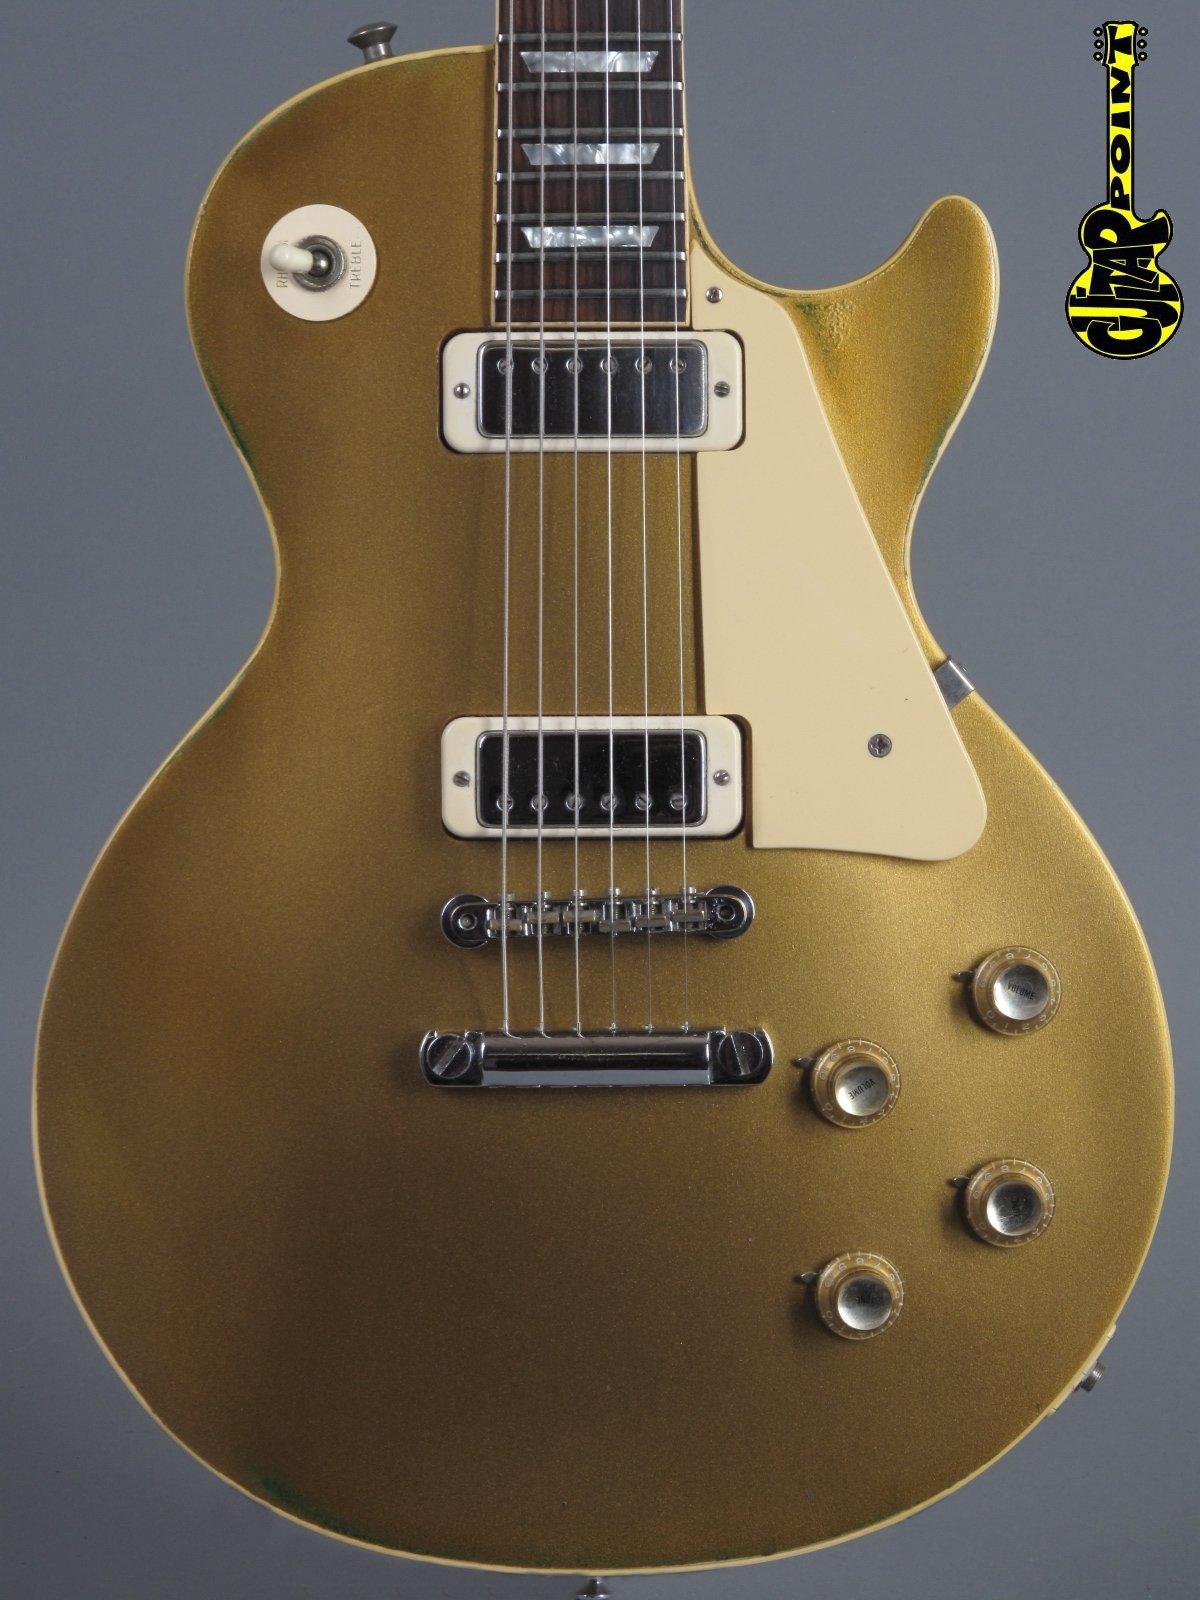 1972 Gibson Les Paul Deluxe - Goldtop